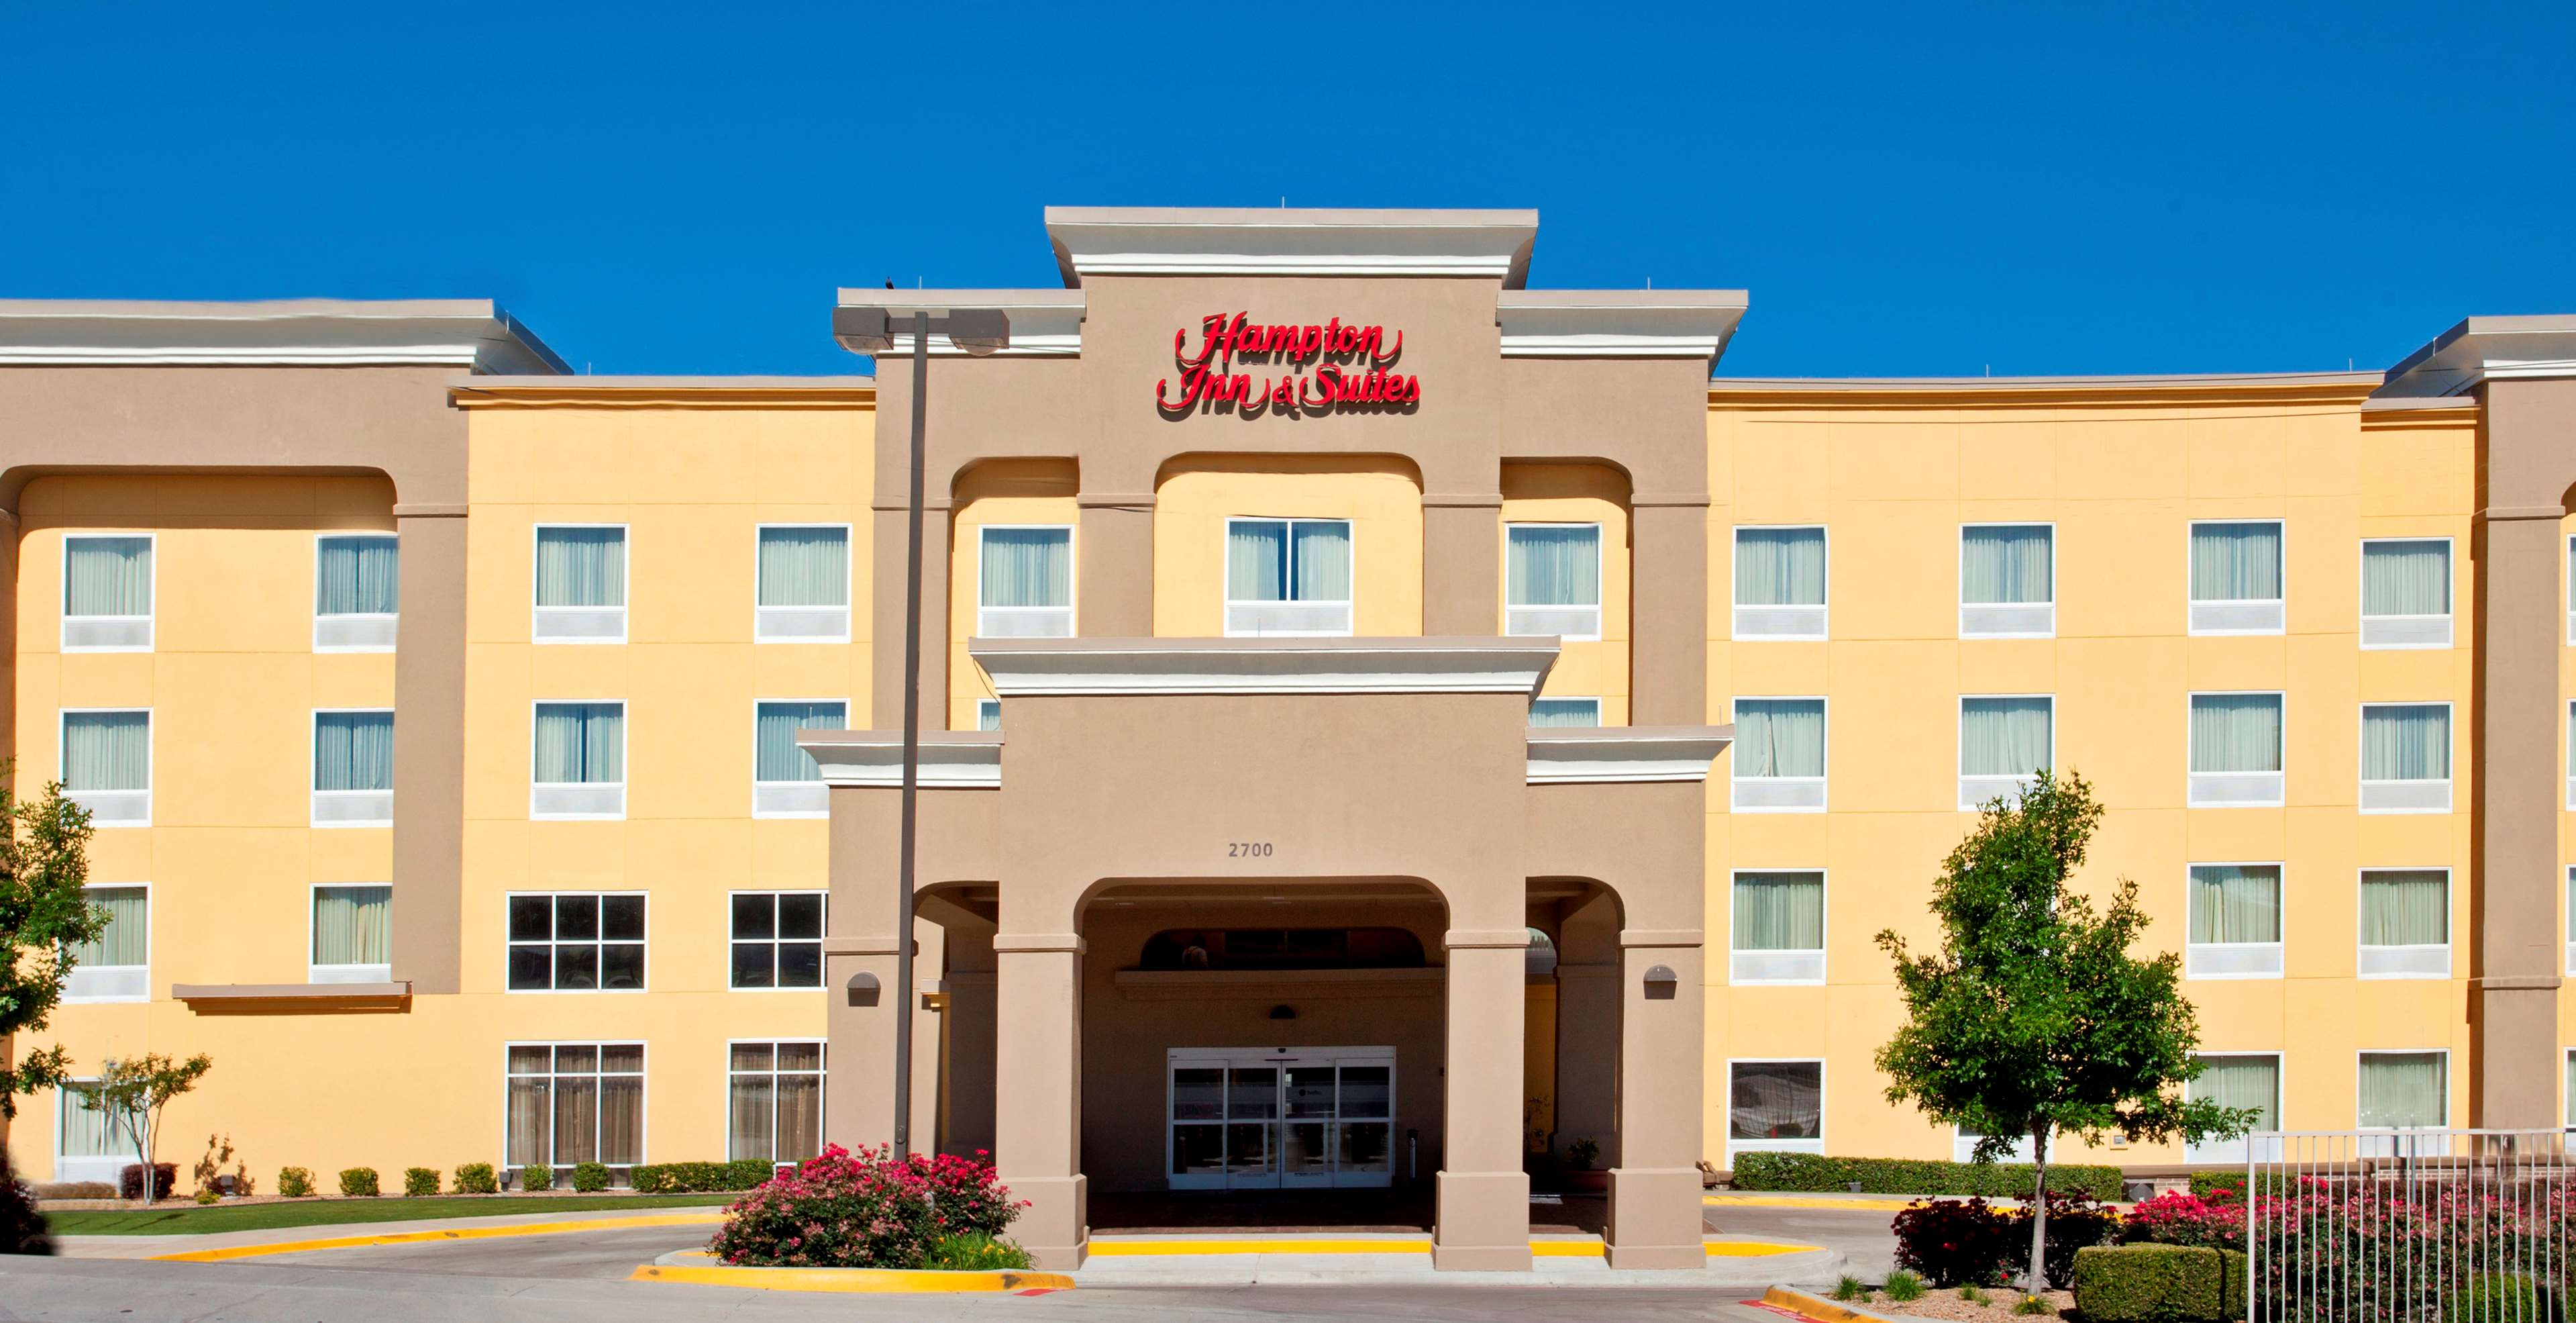 Hampton Inn & Suites Fort Worth-West-I-30 image 1